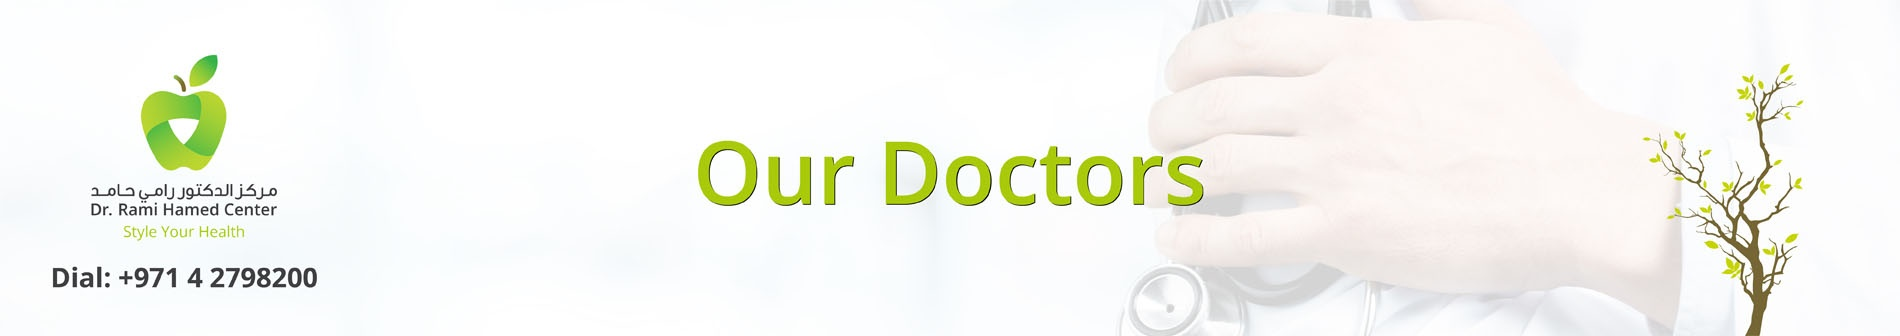 Dubai Urology Clinic   Urology Doctor   Prof. Dr. Rajaie Mahran